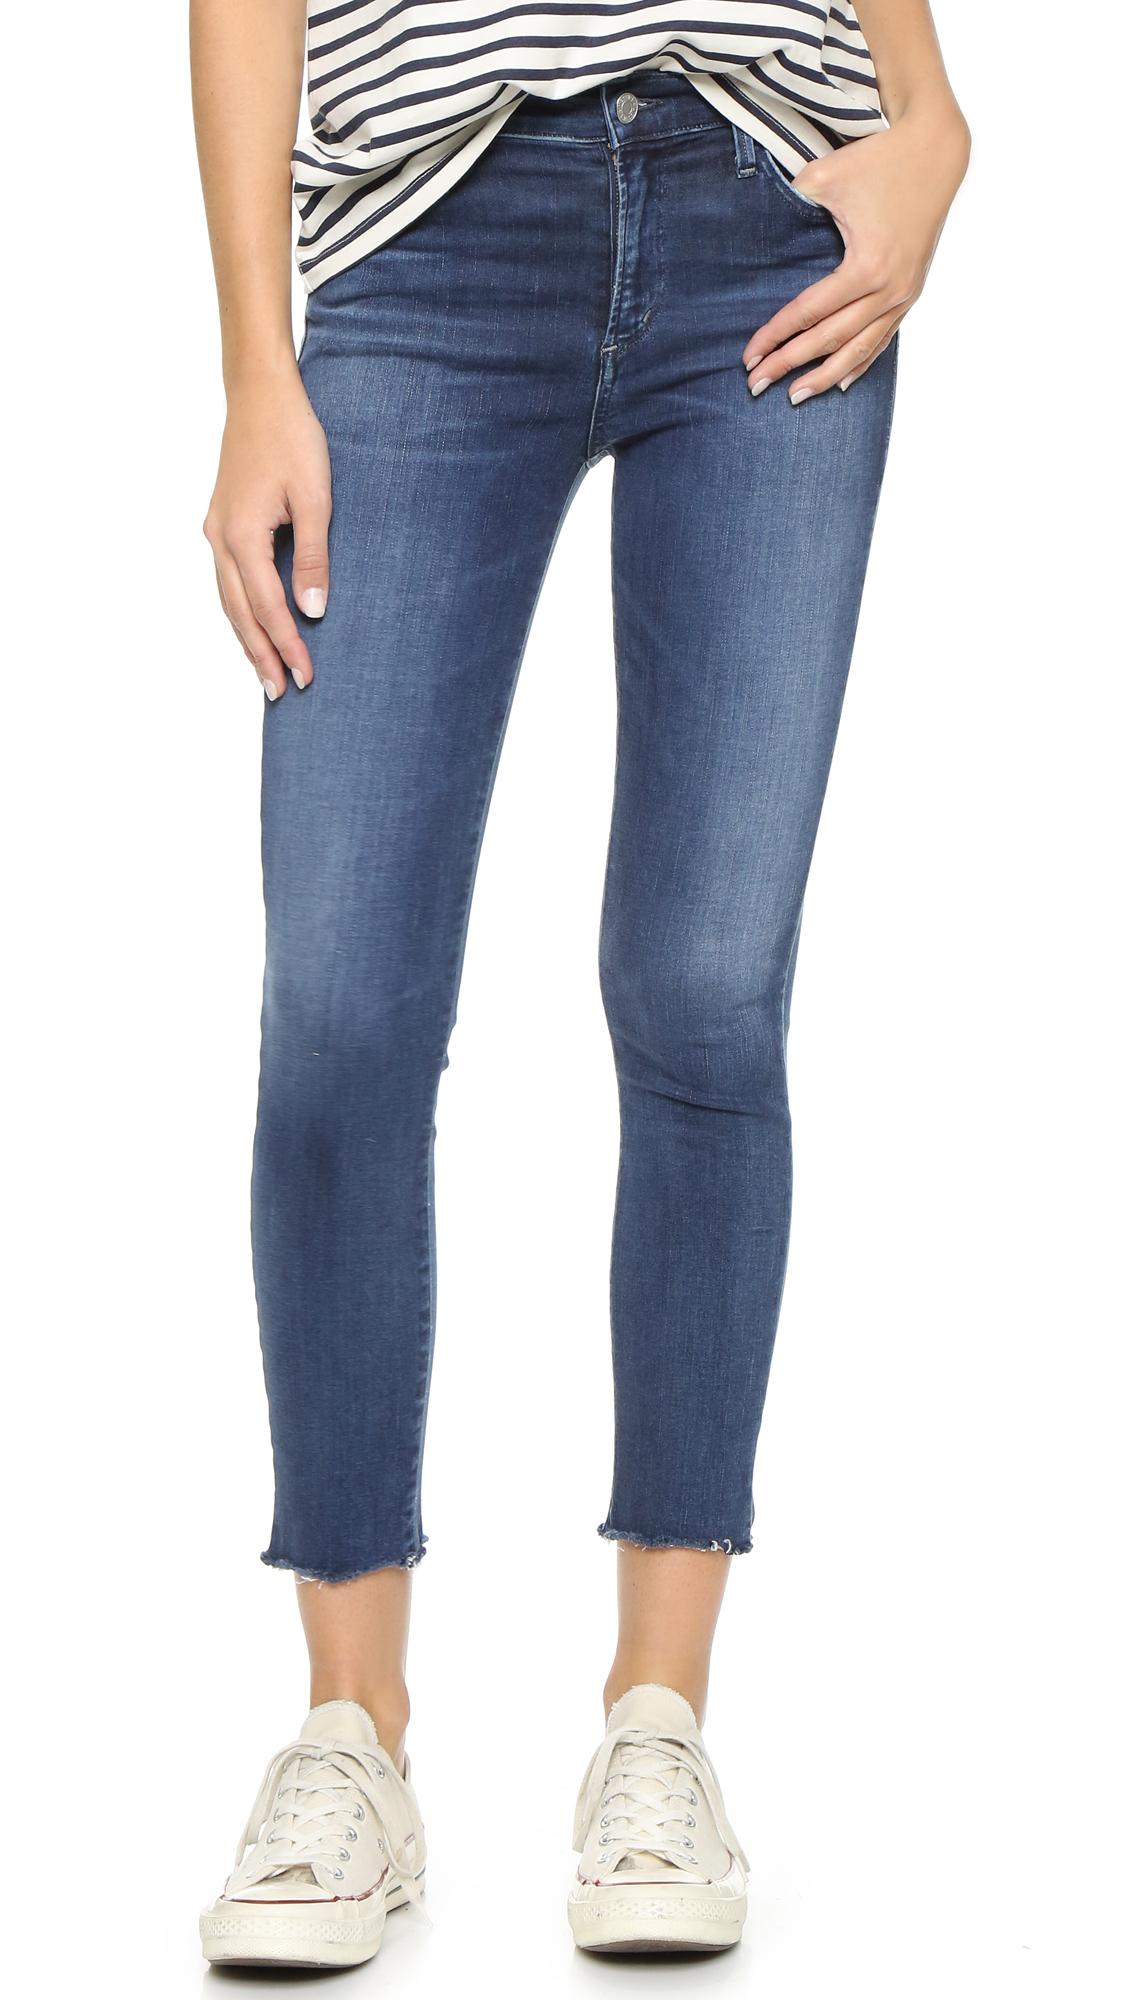 Agolde Sophie High Rise Skinny Crop Jeans - Claremont at Shopbop